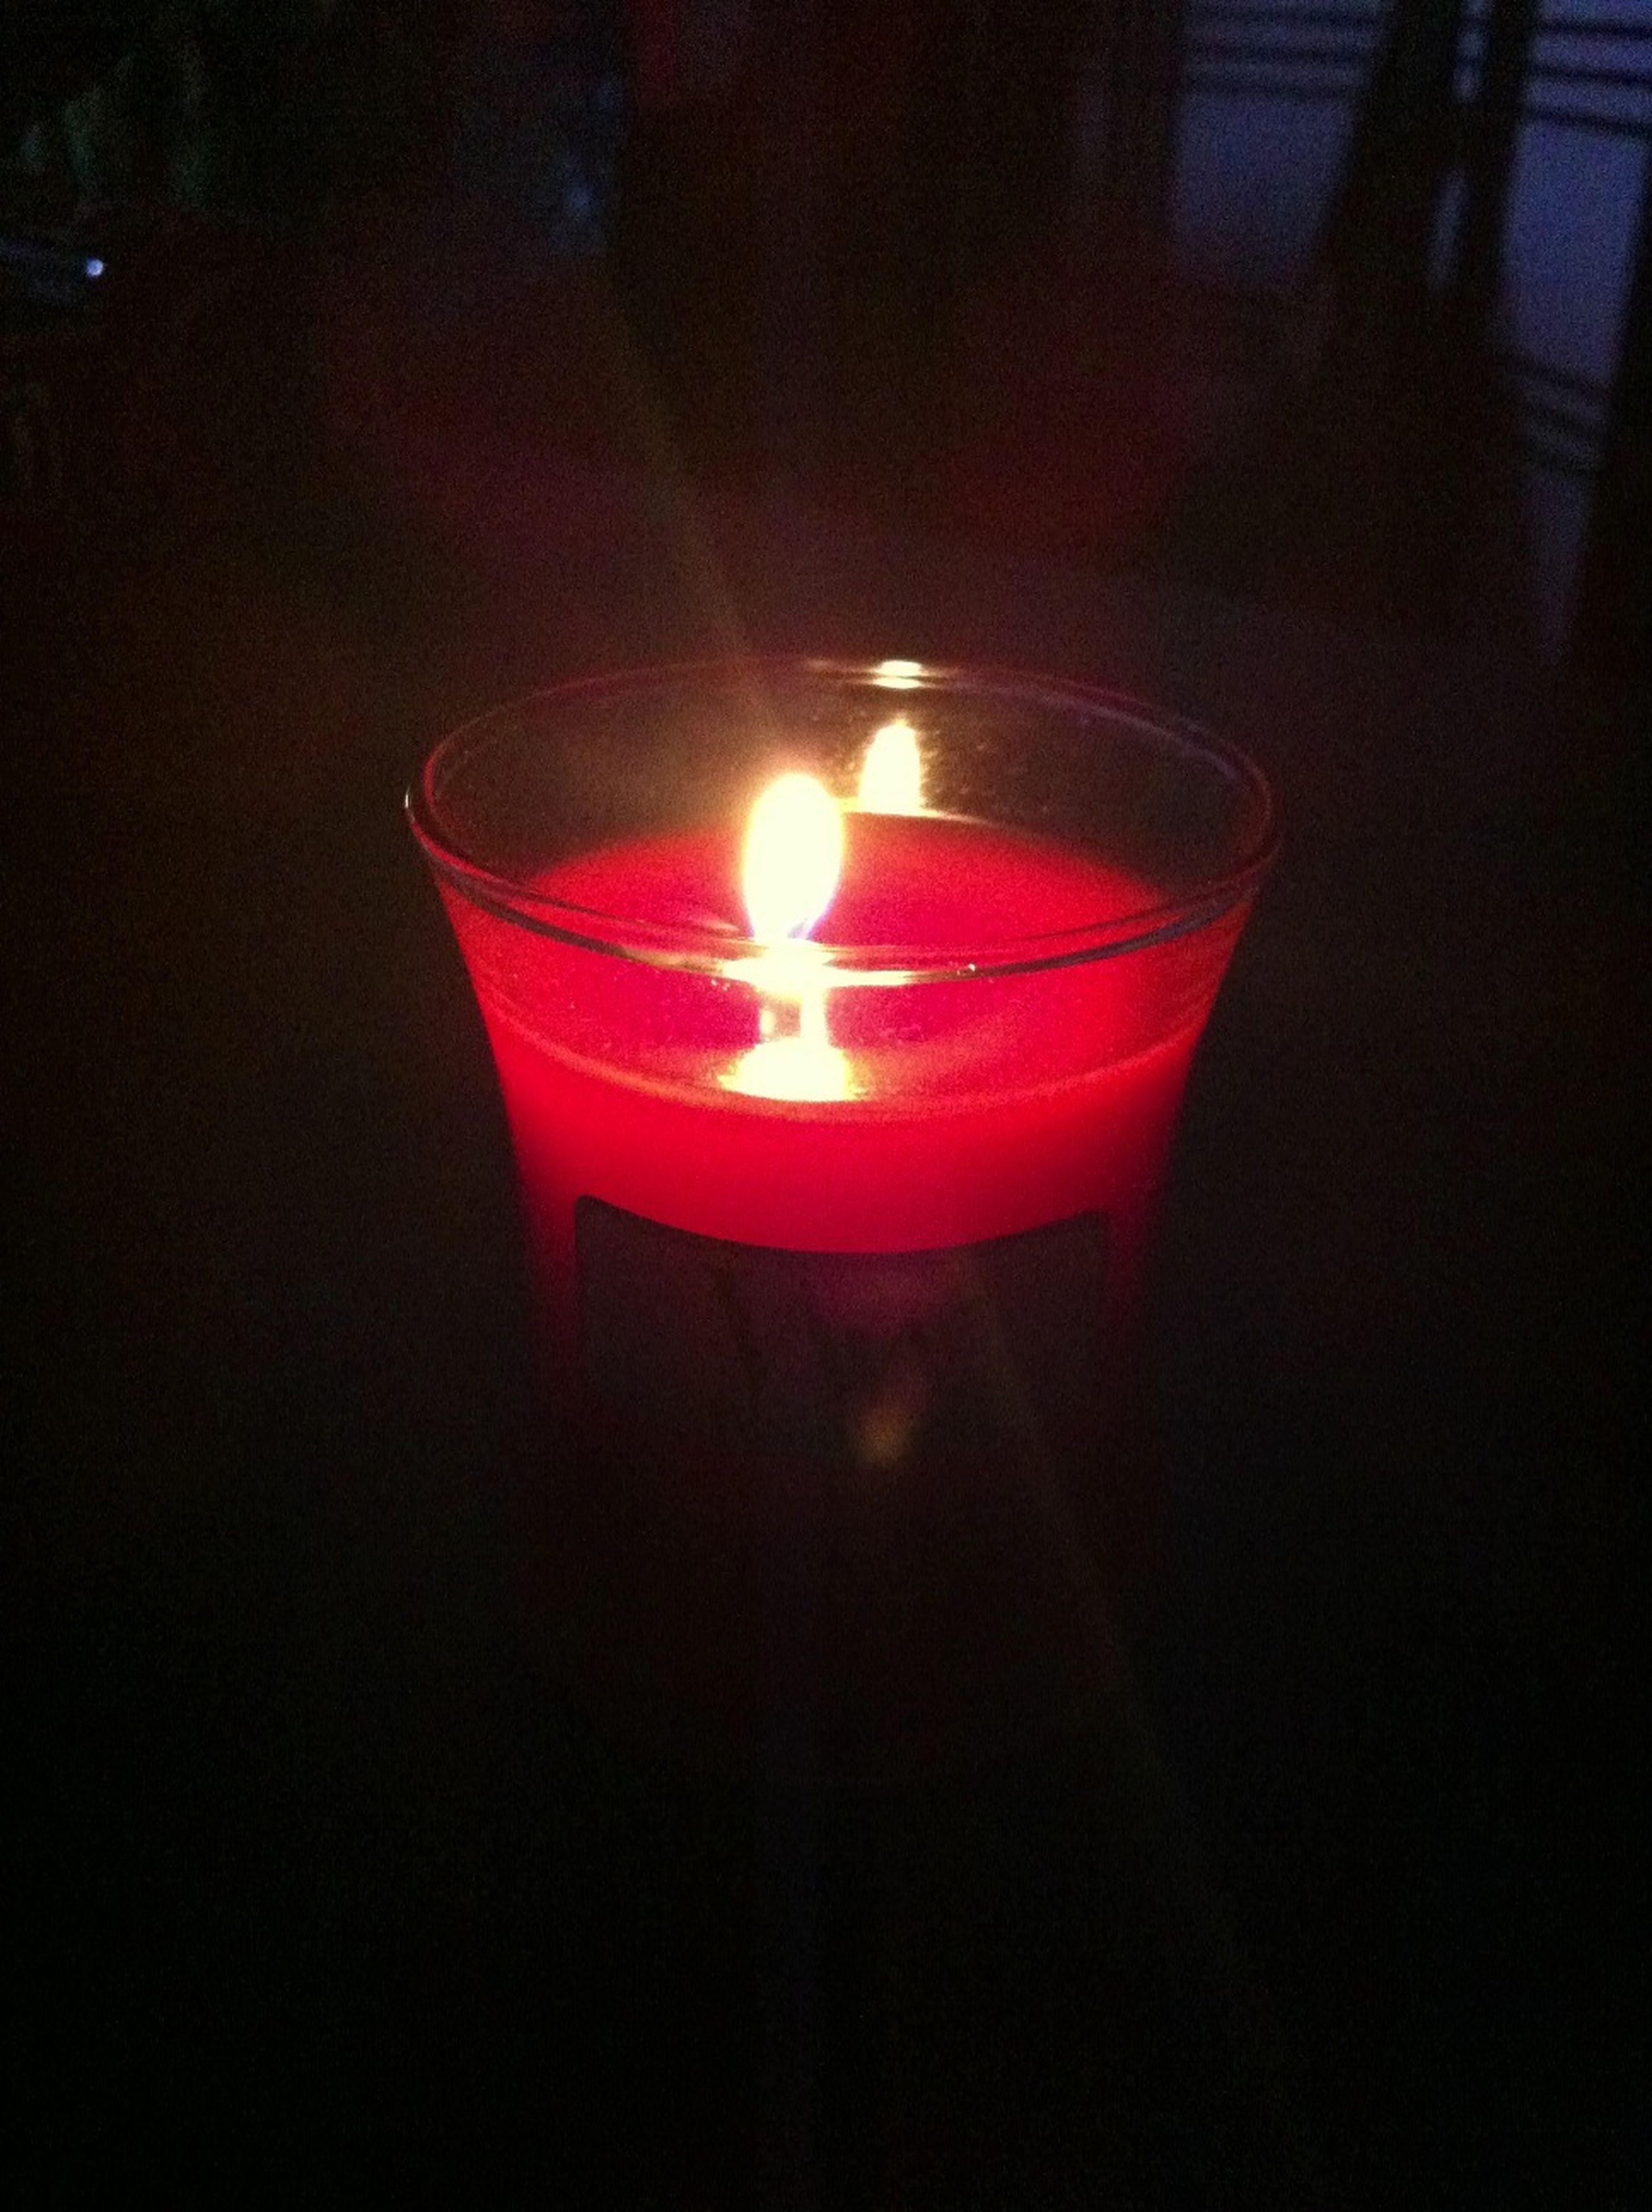 illuminated, indoors, red, lighting equipment, night, glowing, candle, lit, dark, flame, burning, light - natural phenomenon, close-up, electricity, darkroom, fire - natural phenomenon, electric light, candlelight, decoration, lantern